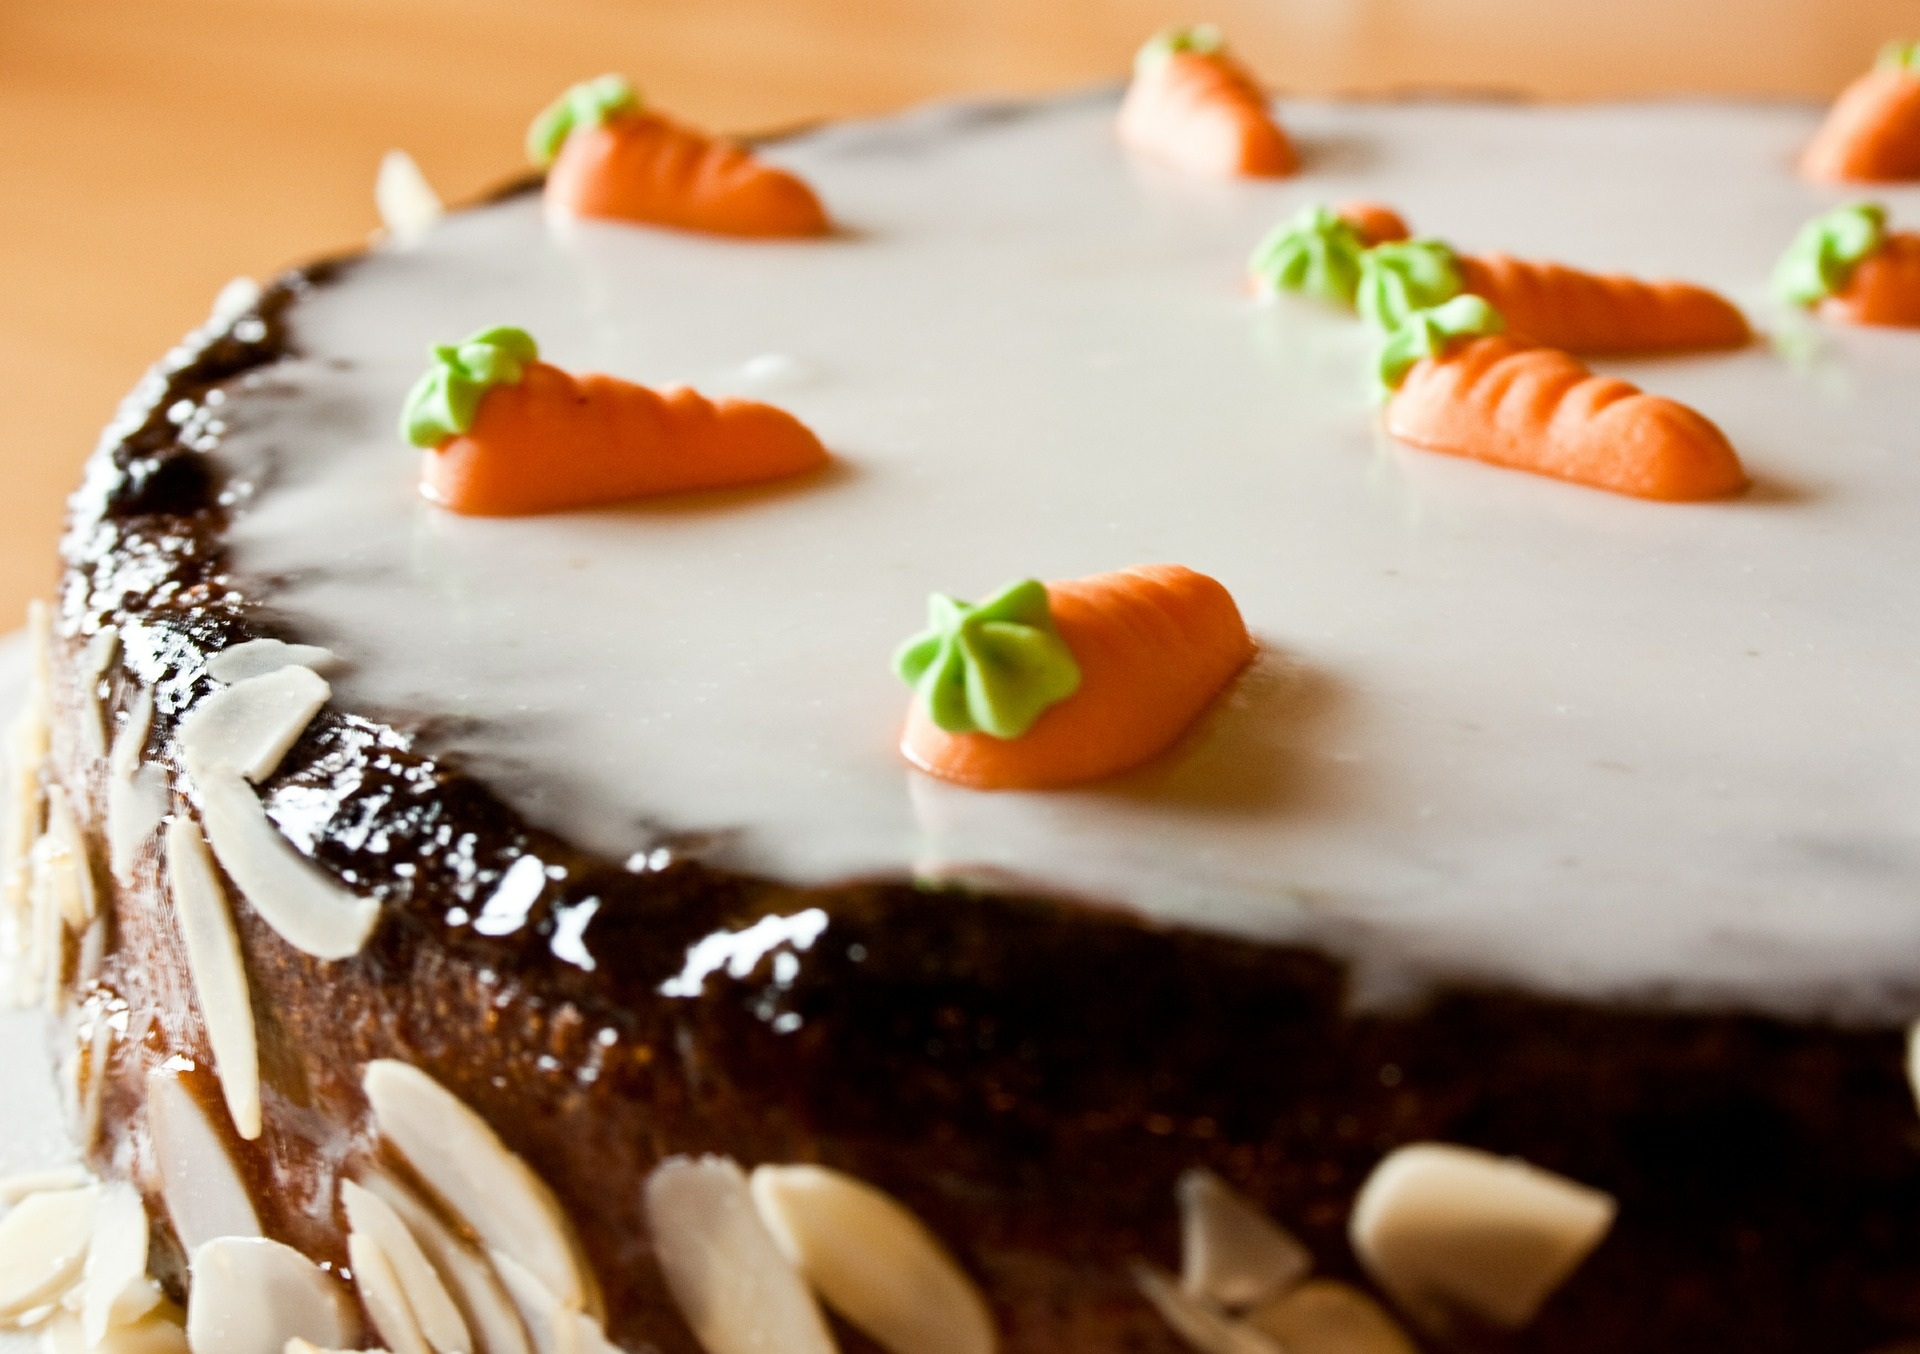 cake-625964_1920.jpg